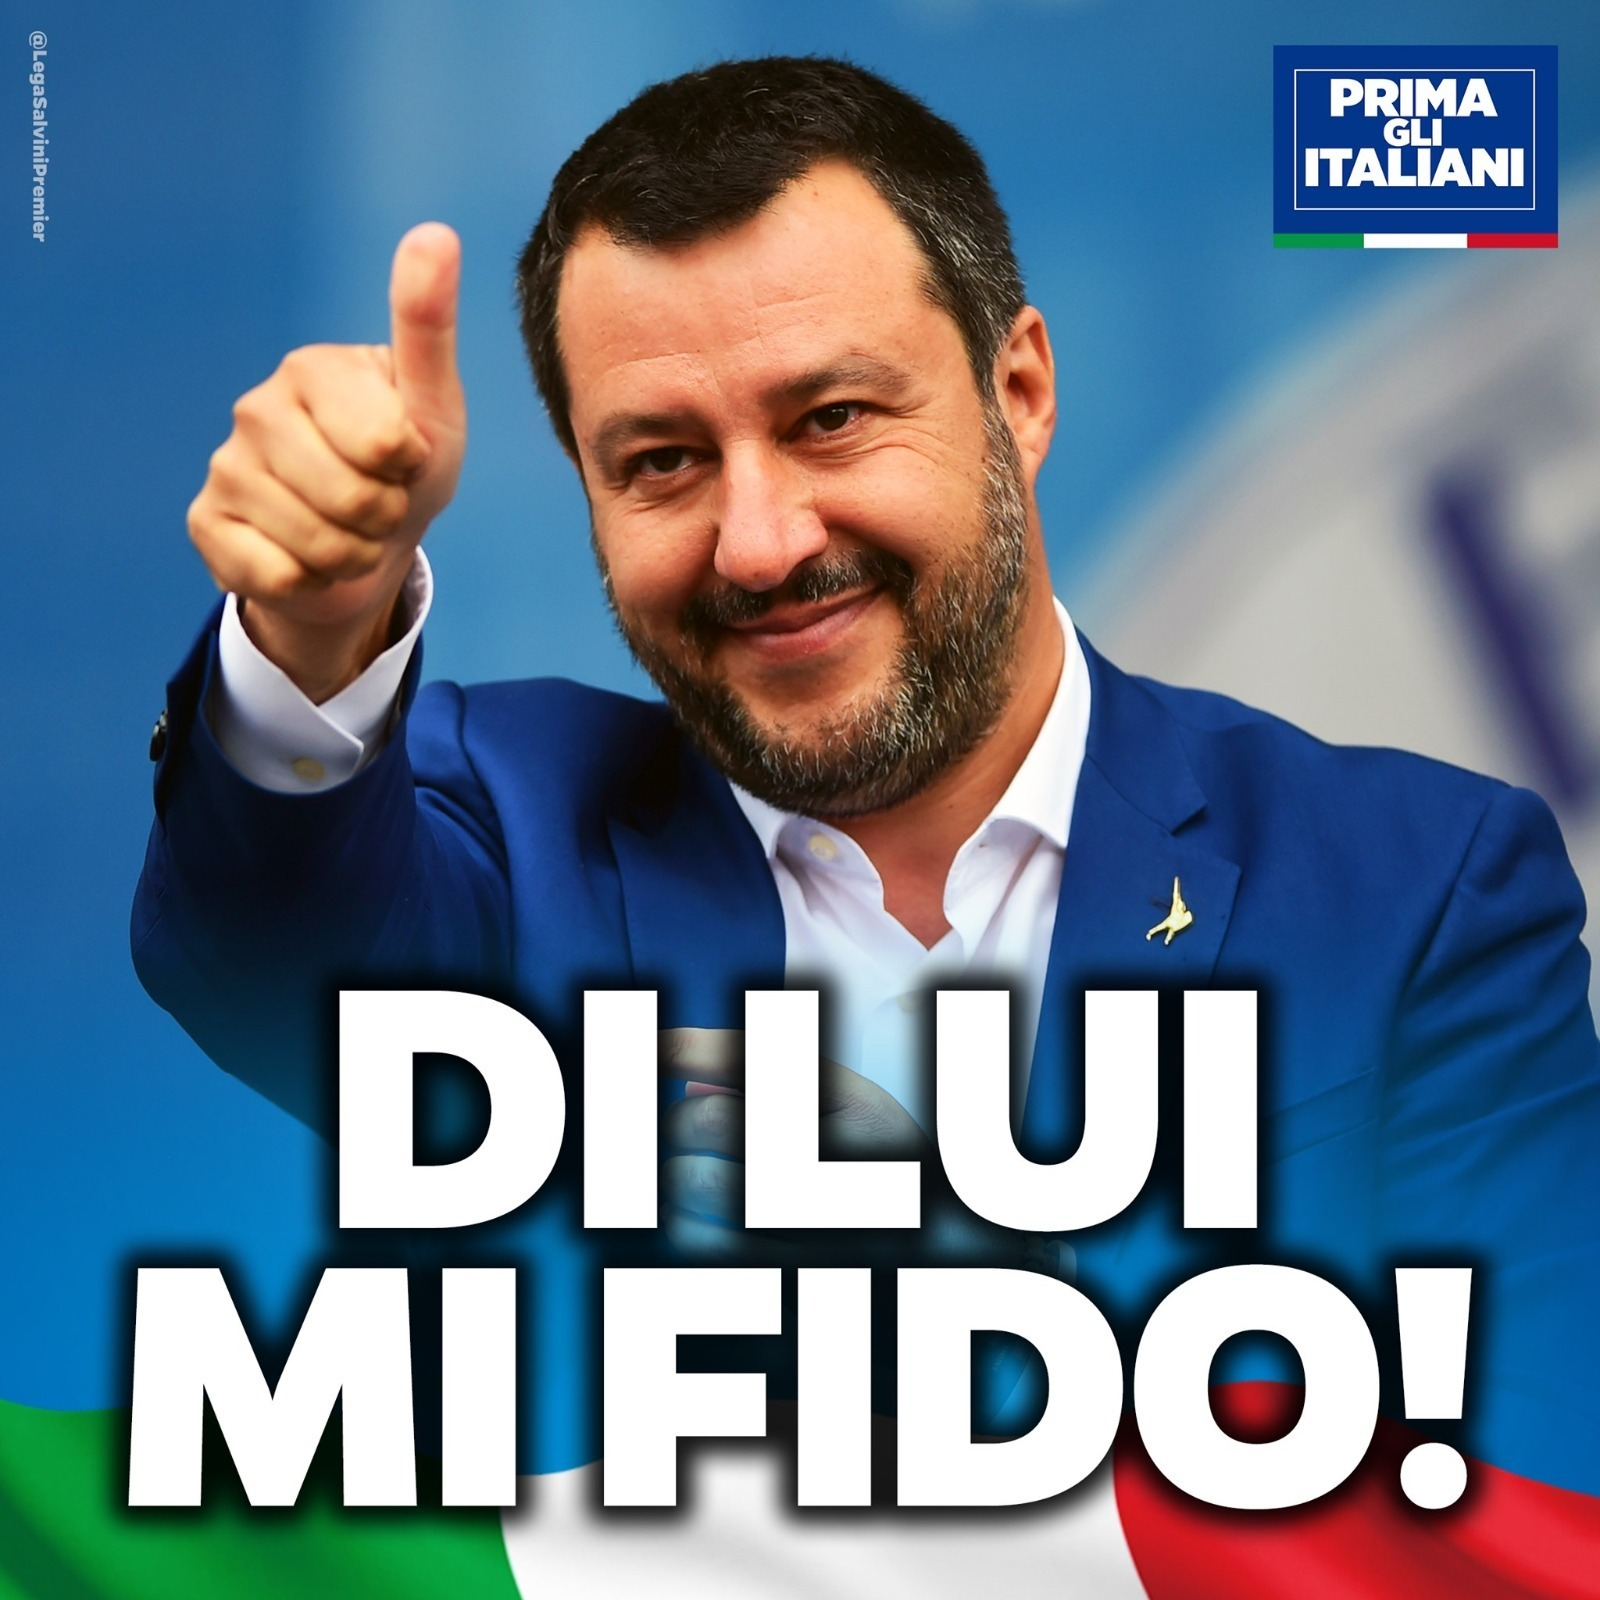 DI LUI MI FIDO!